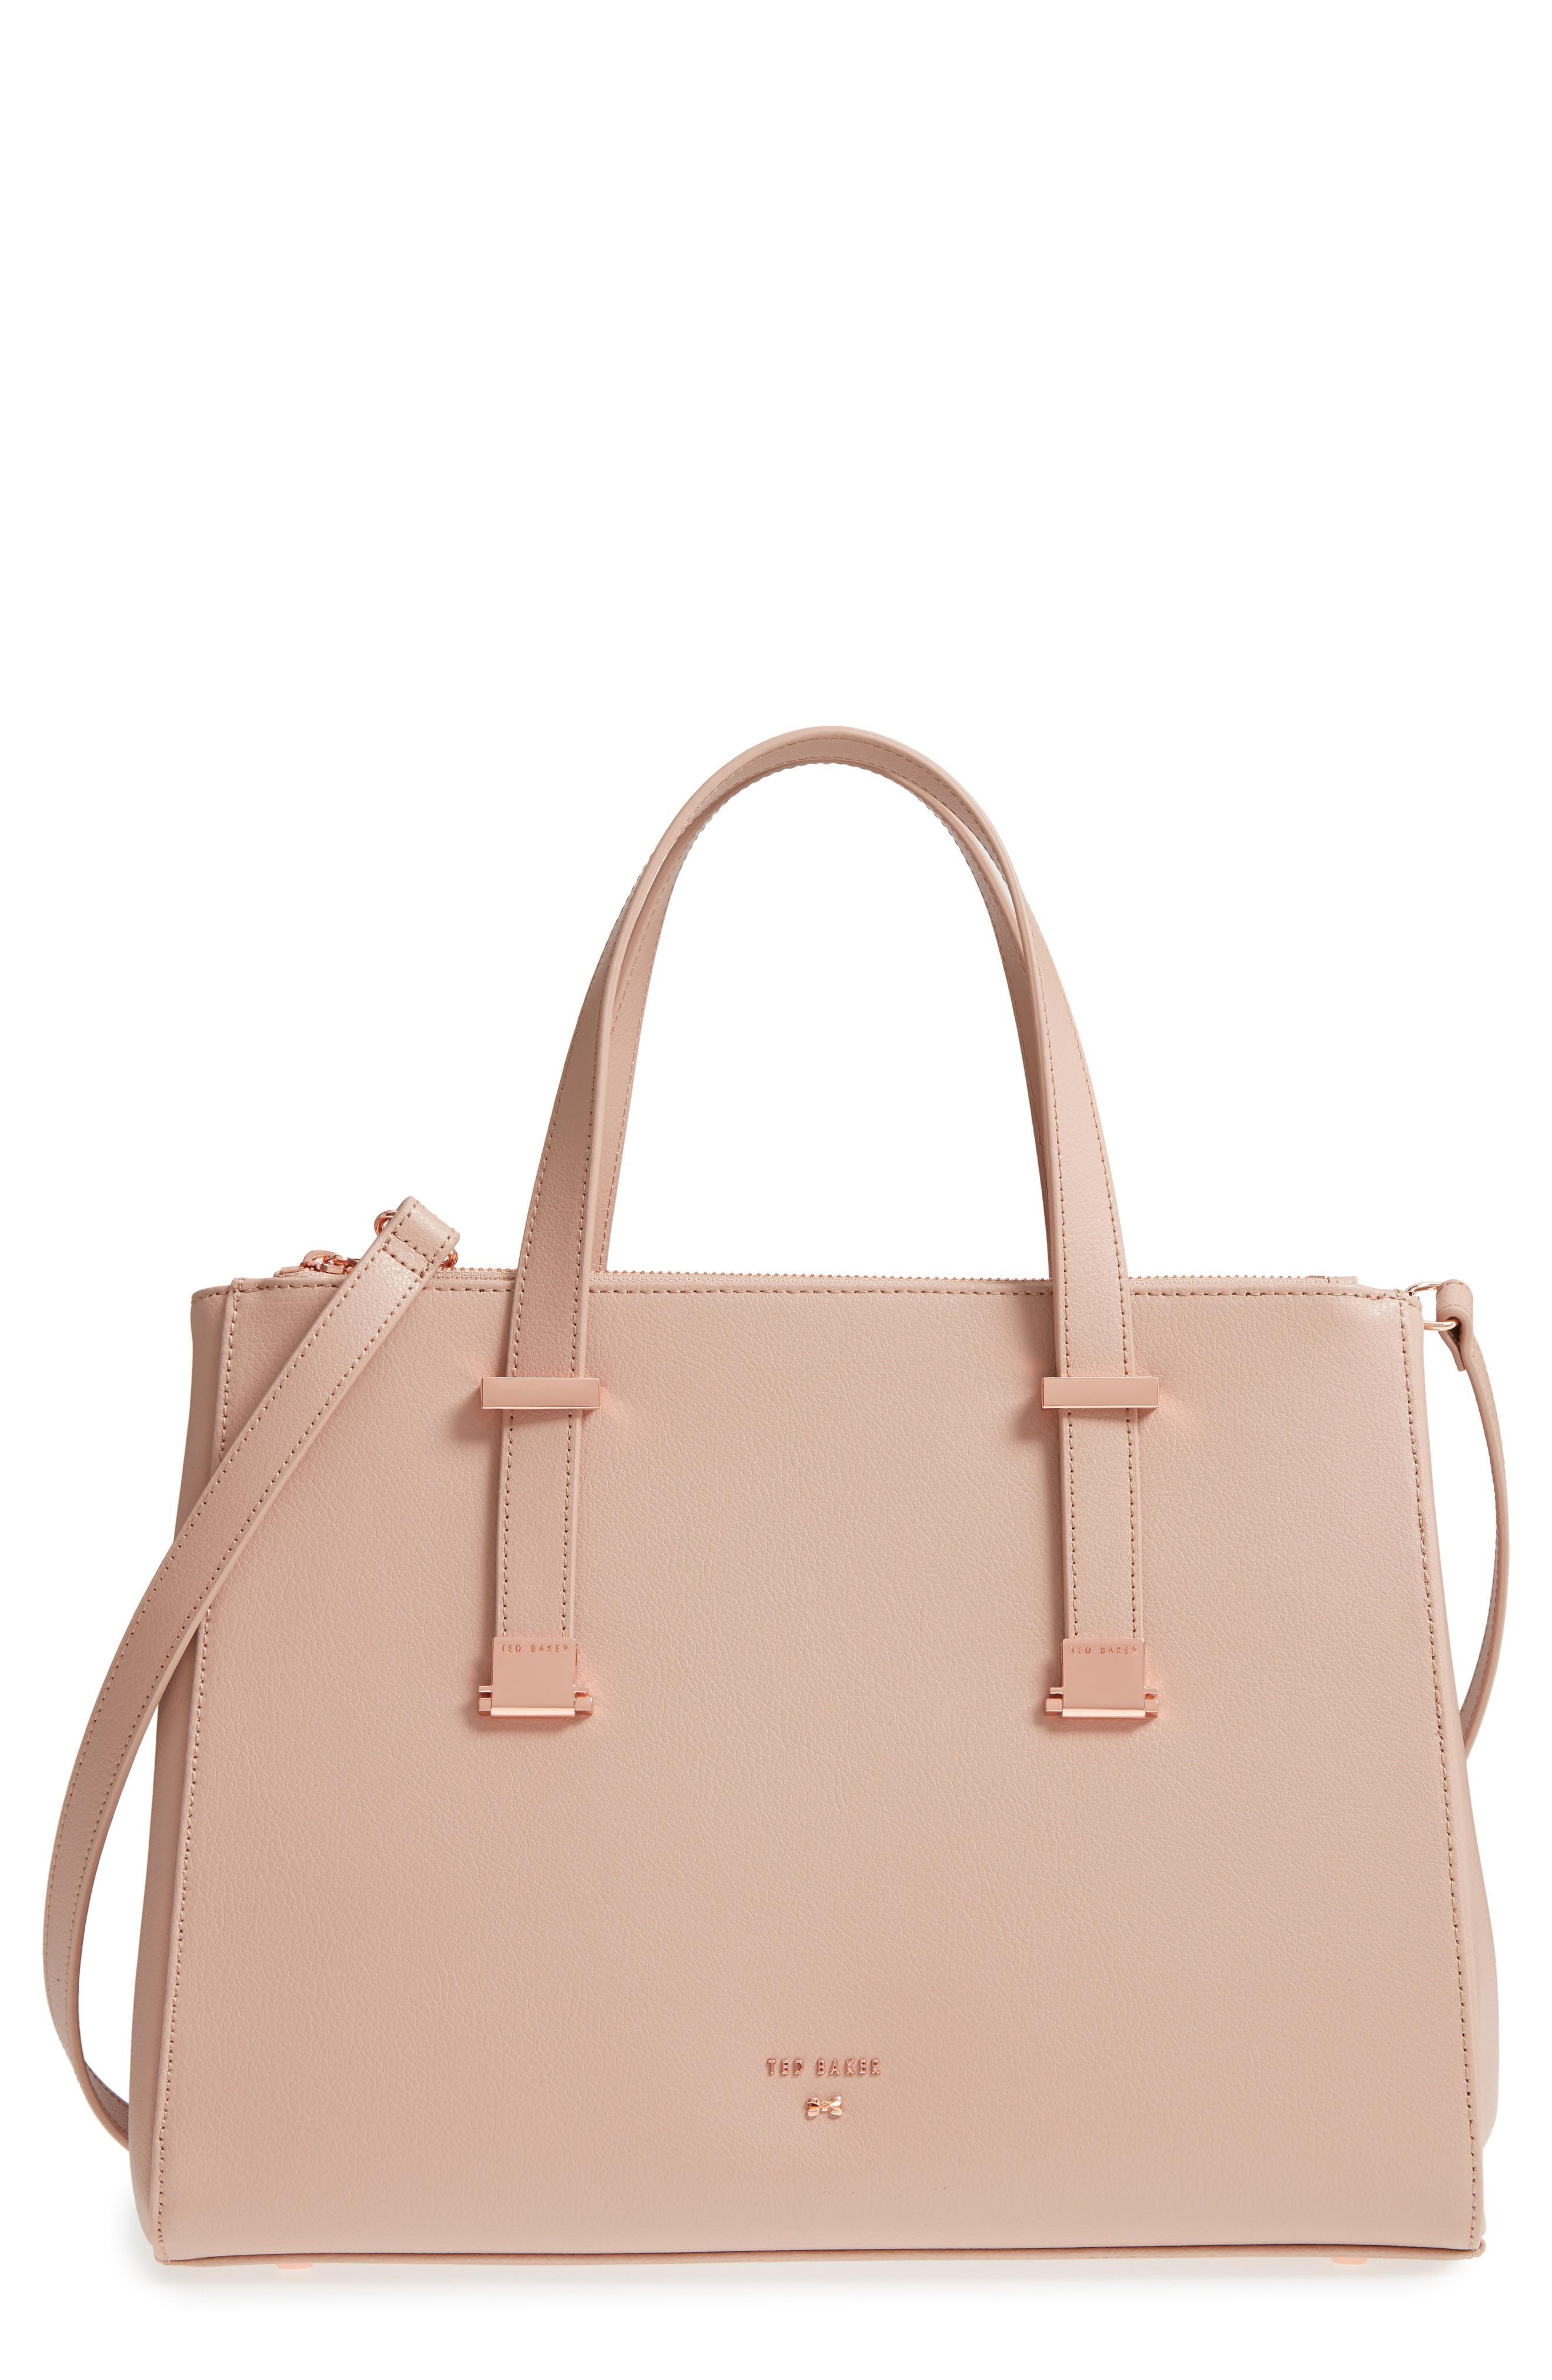 9f2baf79f6 Ted Baker Aminaa Large Adjustable Handle Leather Shopper - Pink In Mink